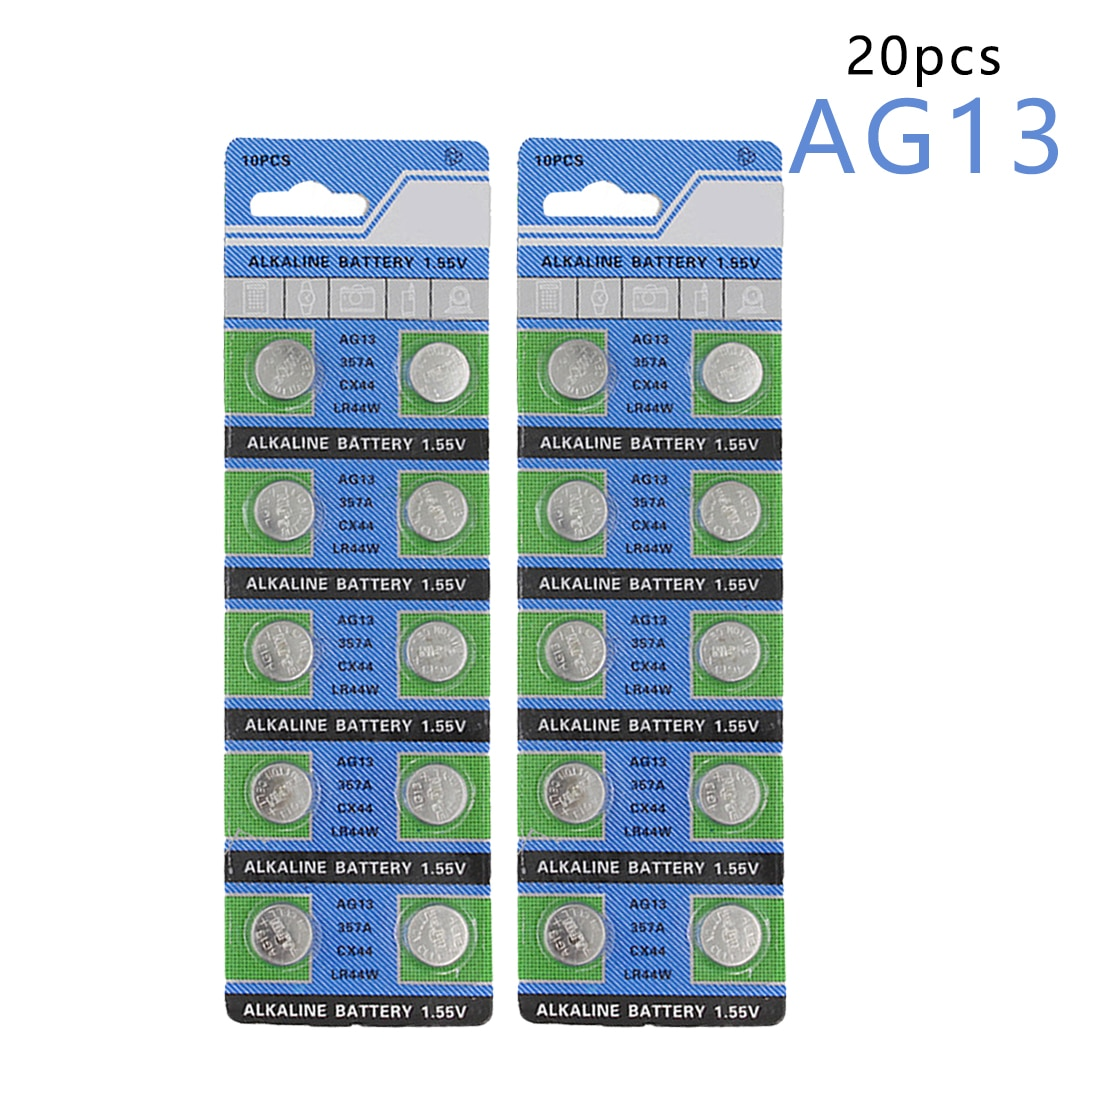 Батарея для монет centechia, 20 шт., AG13 LR44 357A S76E G13, щелочные батареи 1,55 в